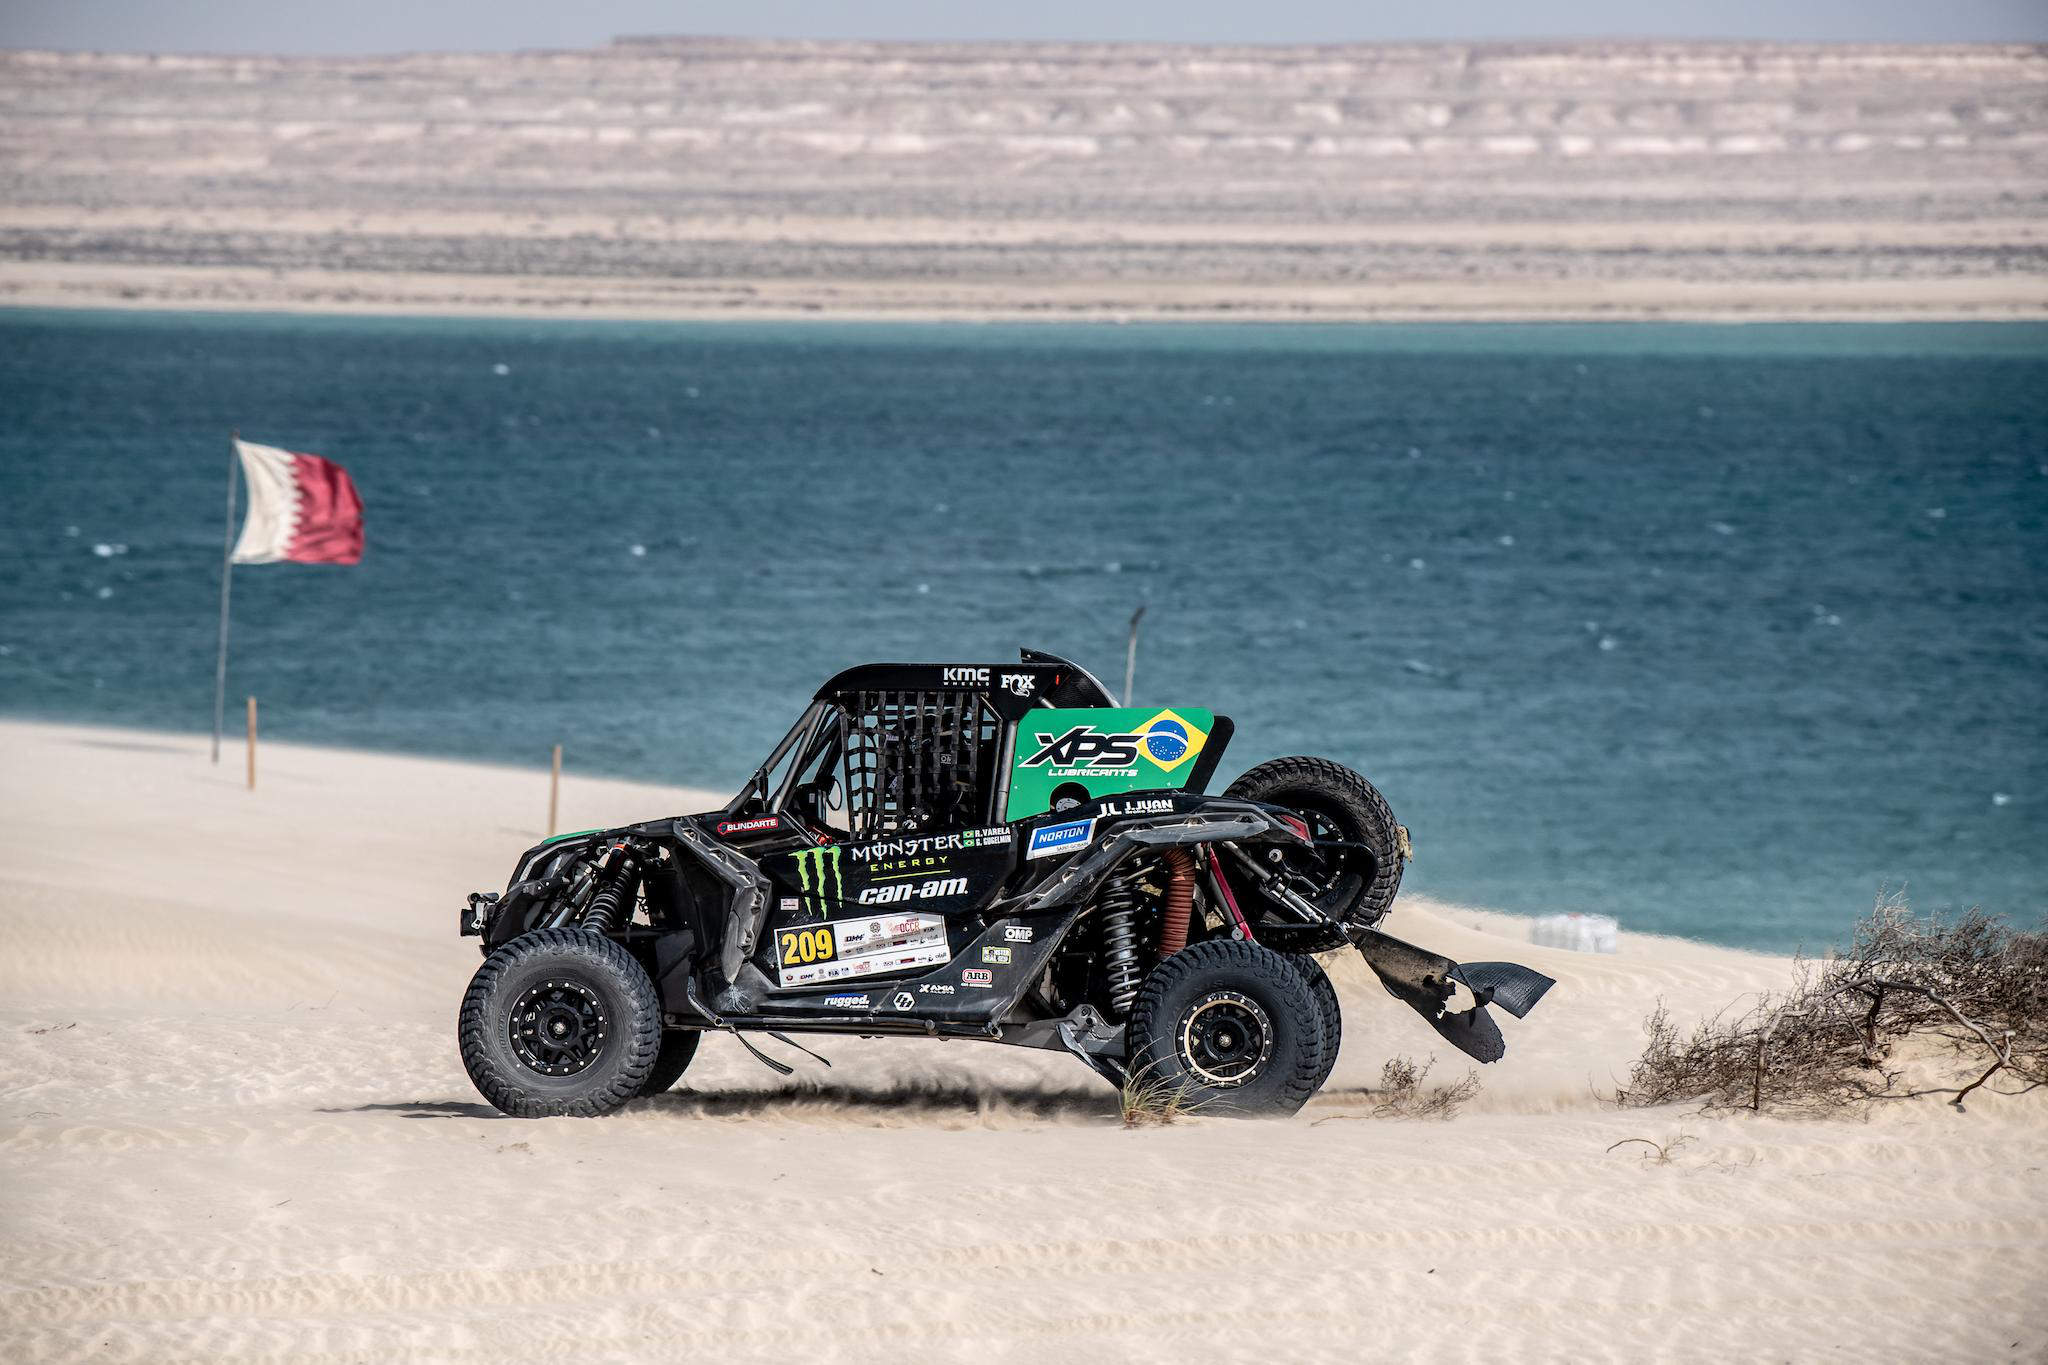 Reinaldo Varela, Qatar Cross-Country Rally 2019